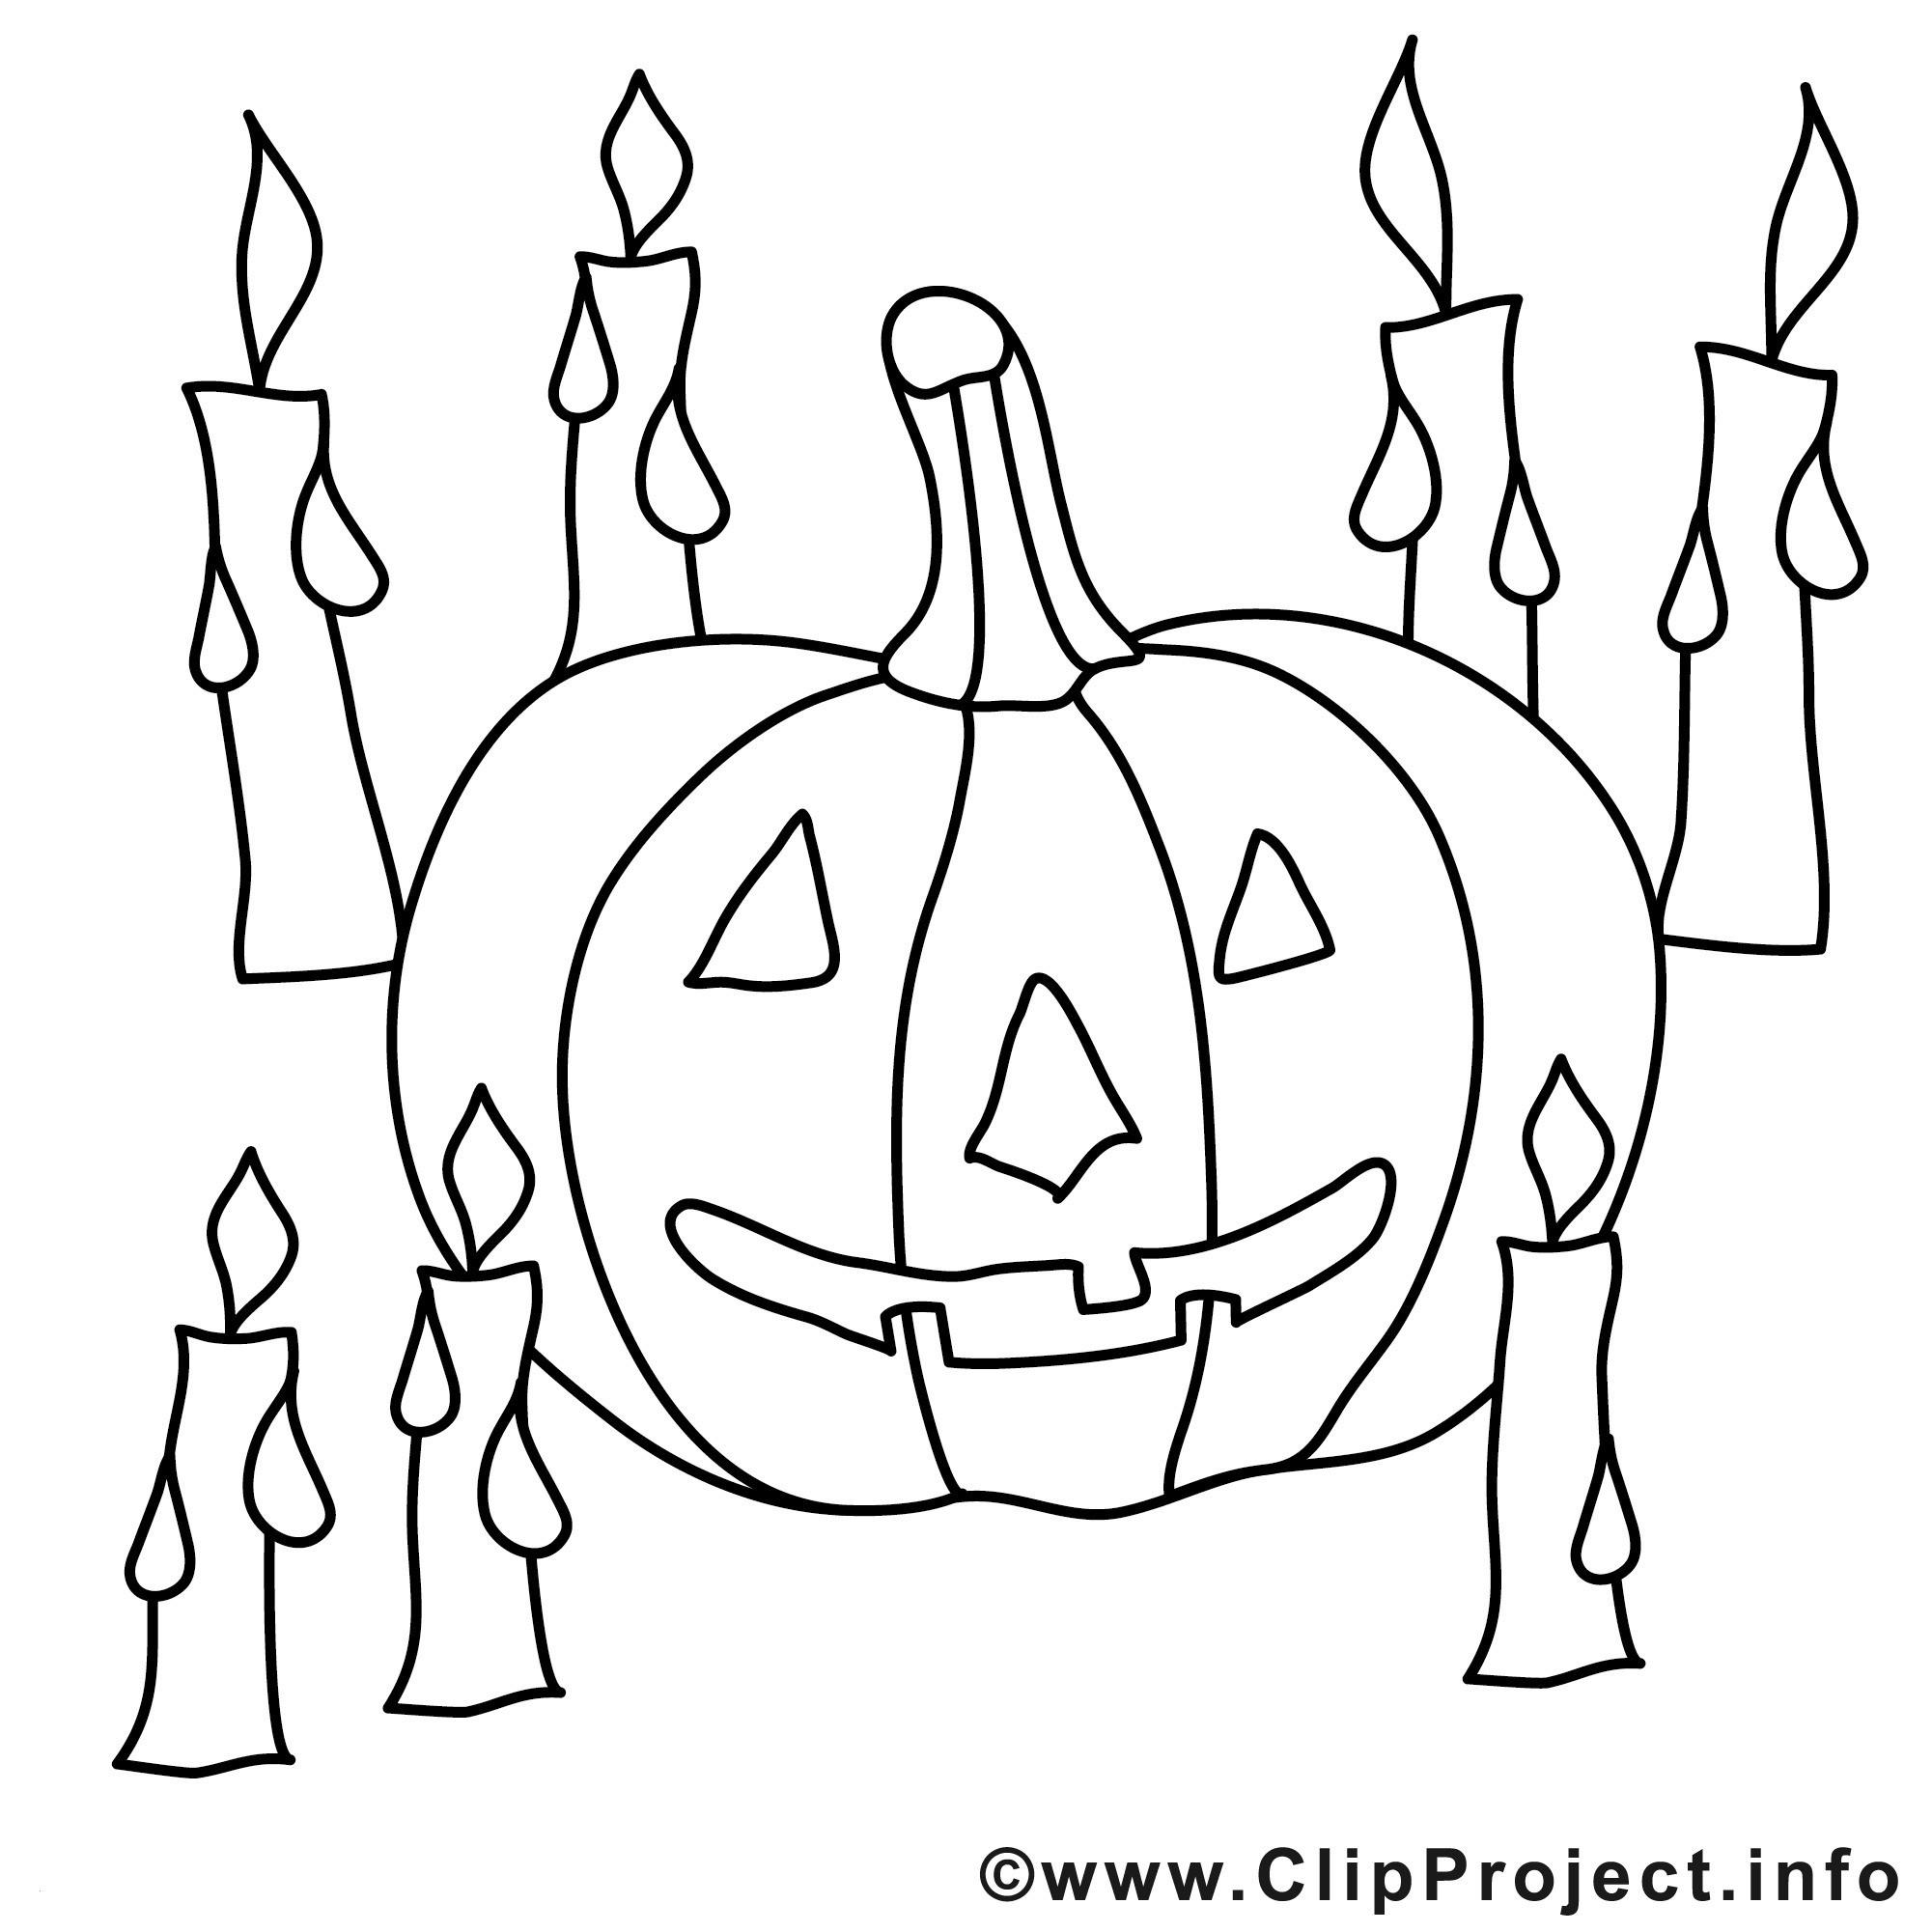 99 neu halloween ausmalbilder geister bild kinder bilder. Black Bedroom Furniture Sets. Home Design Ideas